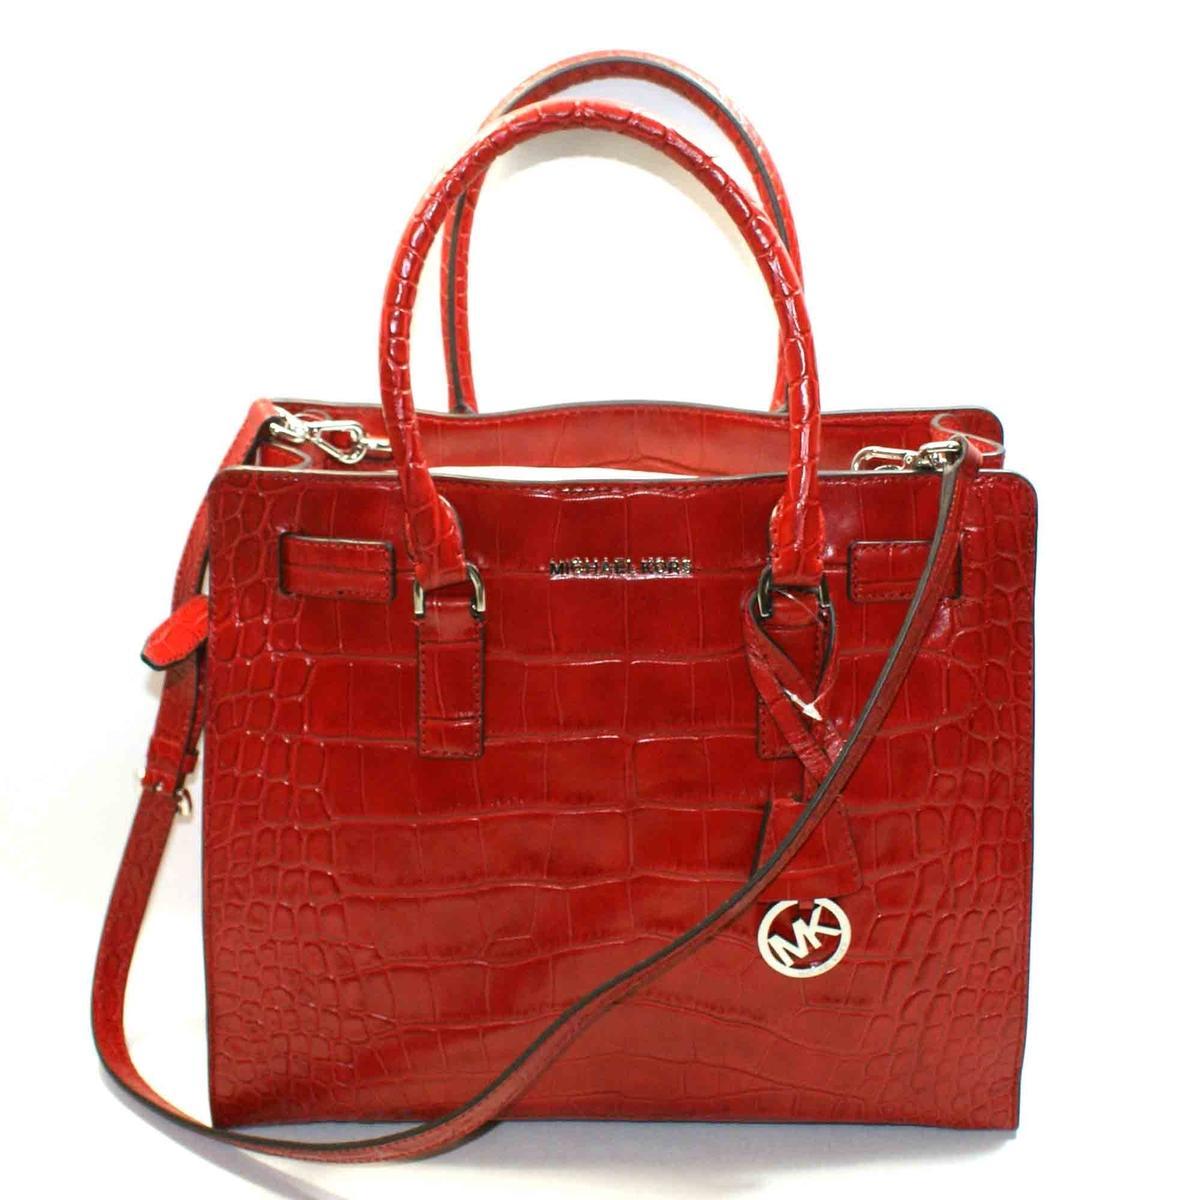 Case Design micheal kors phone cases : Michael Kors Dillon Large Embossed Leather Tote/ Shoulder Bag Dark Red